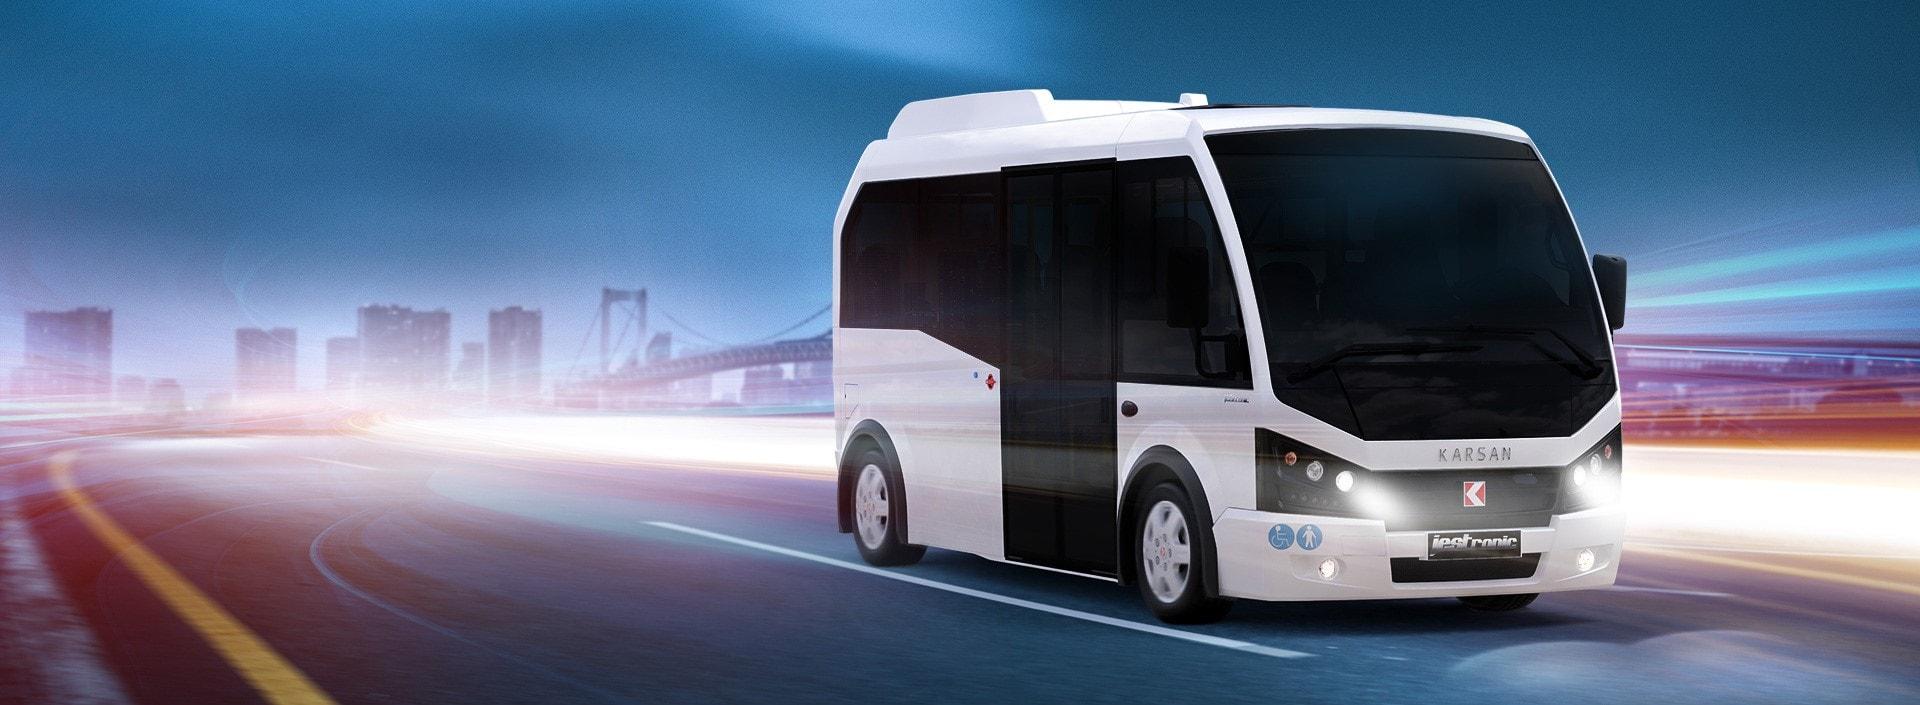 staff transportation services in Dubai